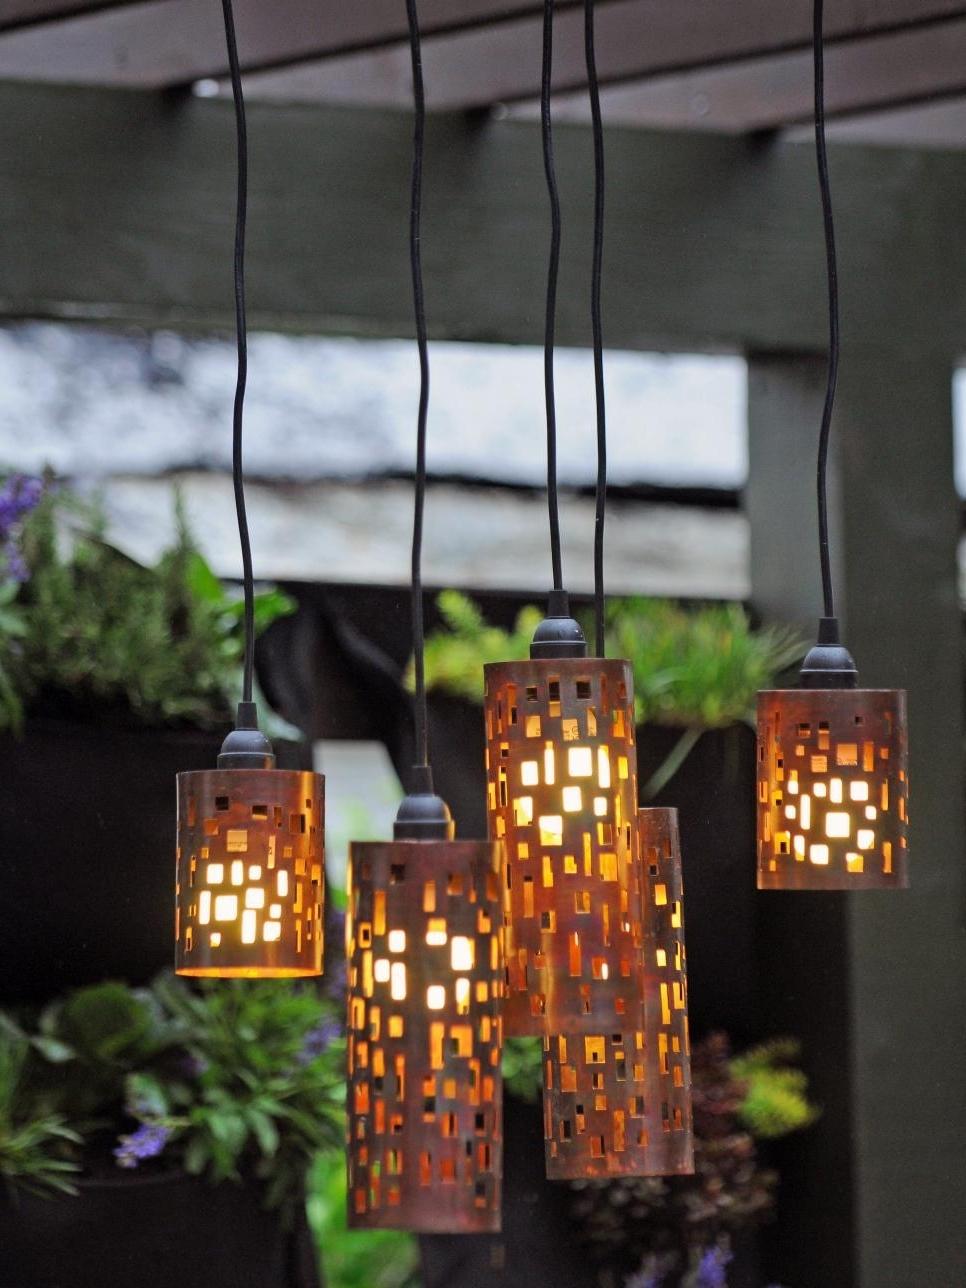 Outdoor Lighting: Amusing Outdoor Hanging Lights Patio How To Hang Regarding Fashionable Inexpensive Outdoor Hanging Lights (View 3 of 20)